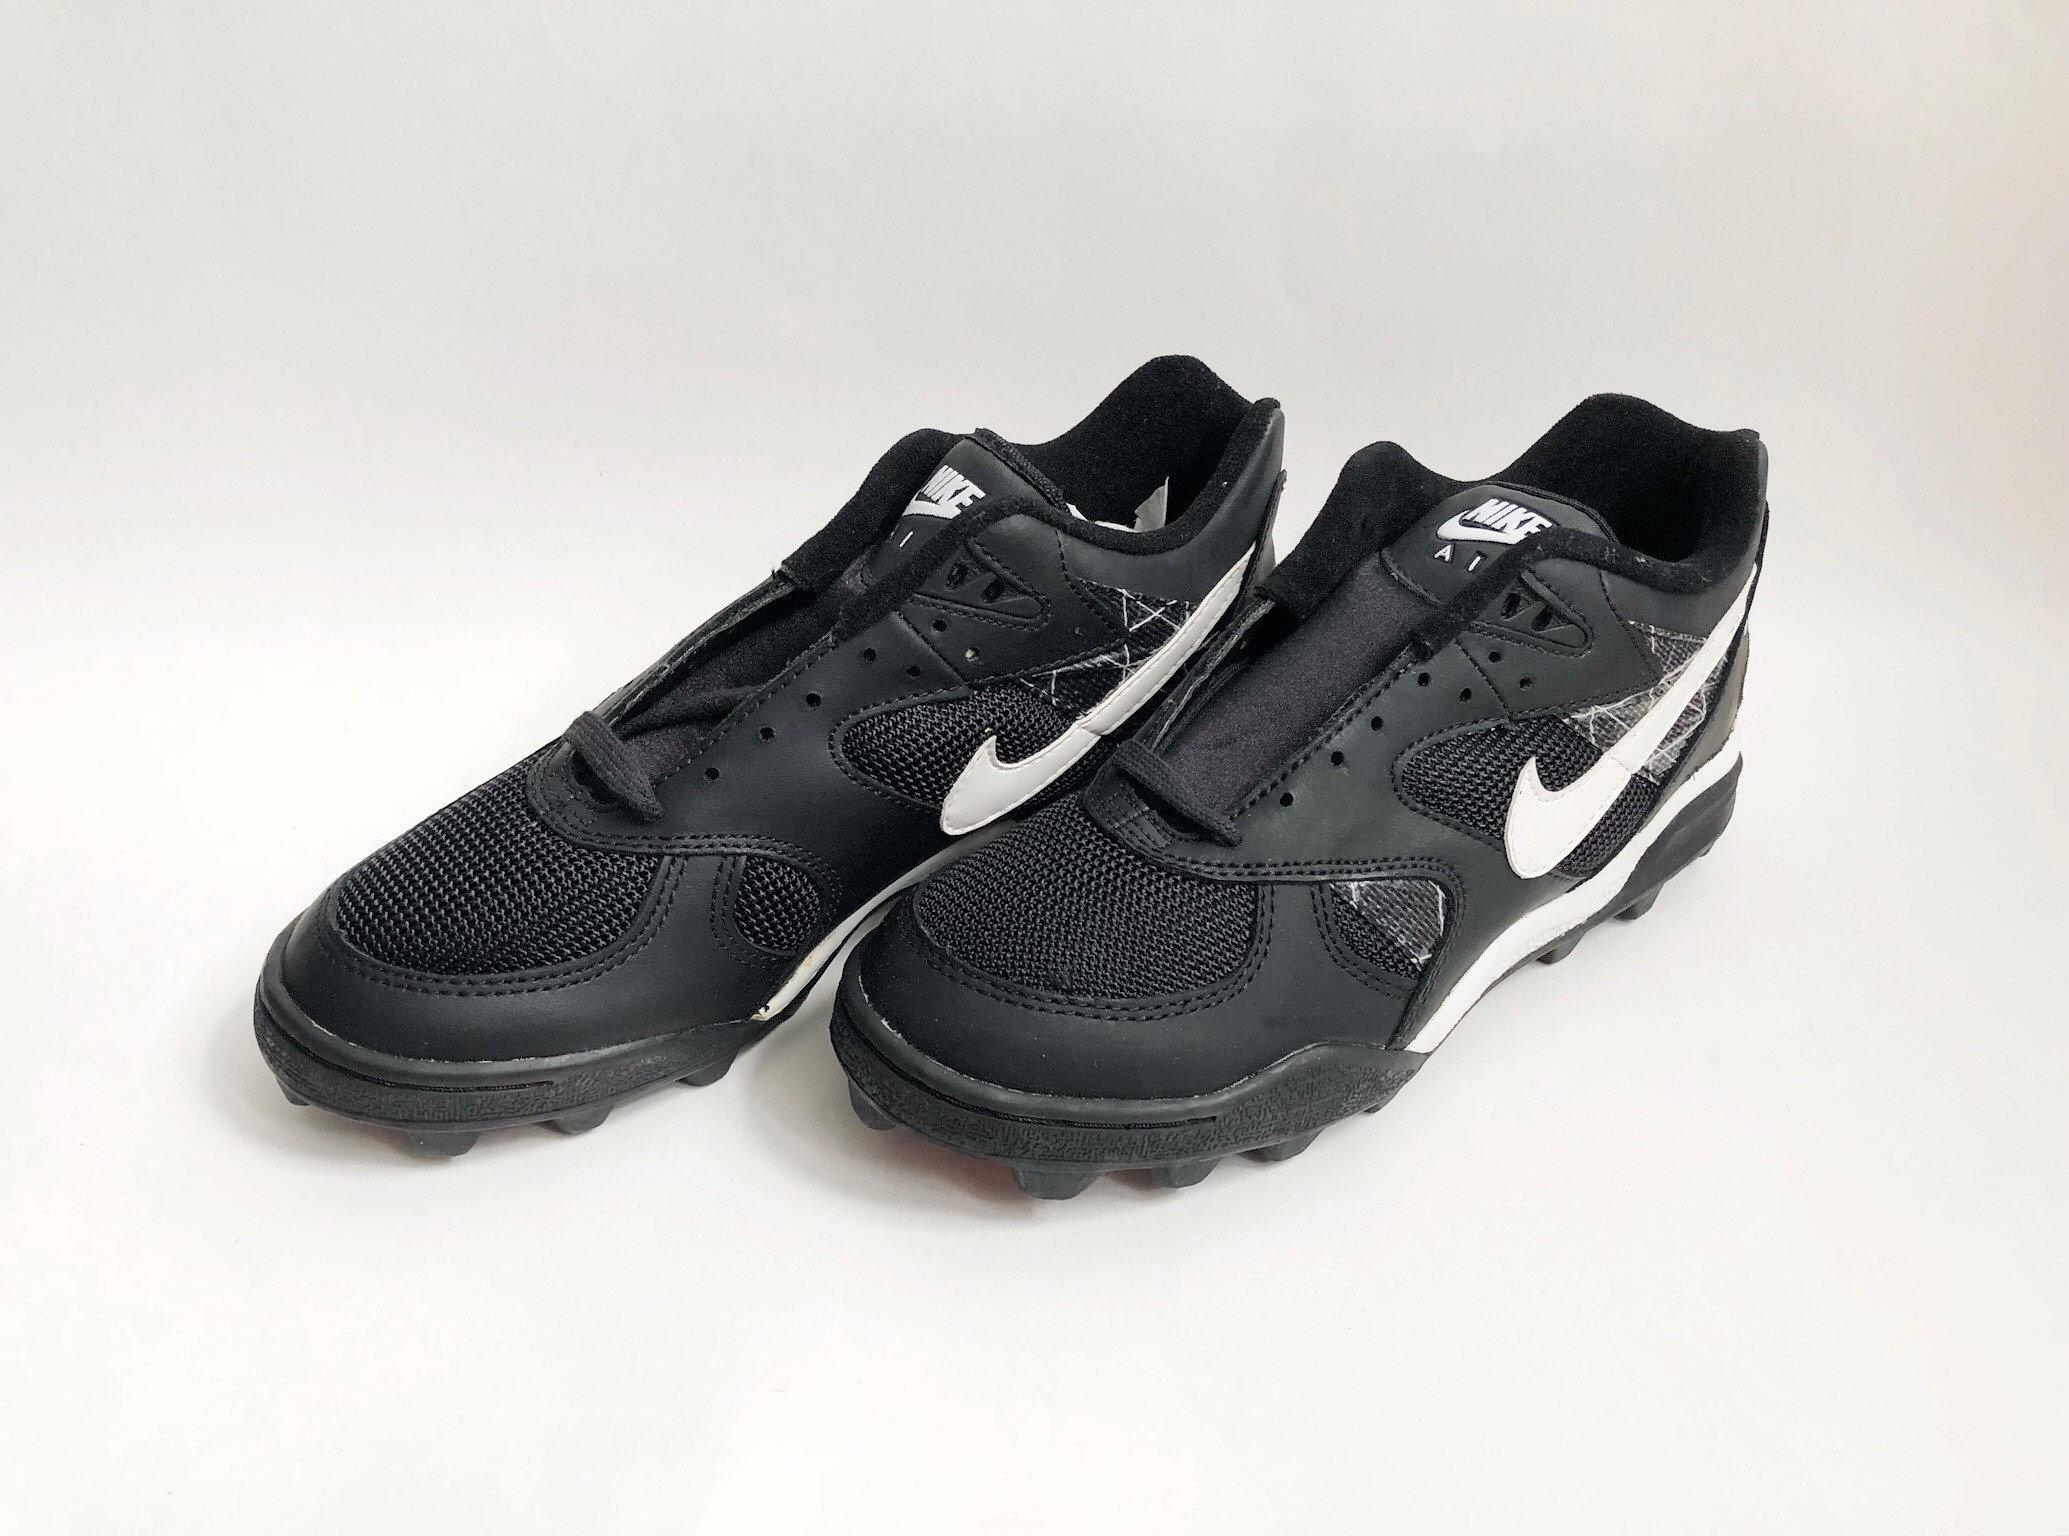 vintage nike air boss shark football shoes mens mens shoes size 9 deadstock NIB 1993 96bc62